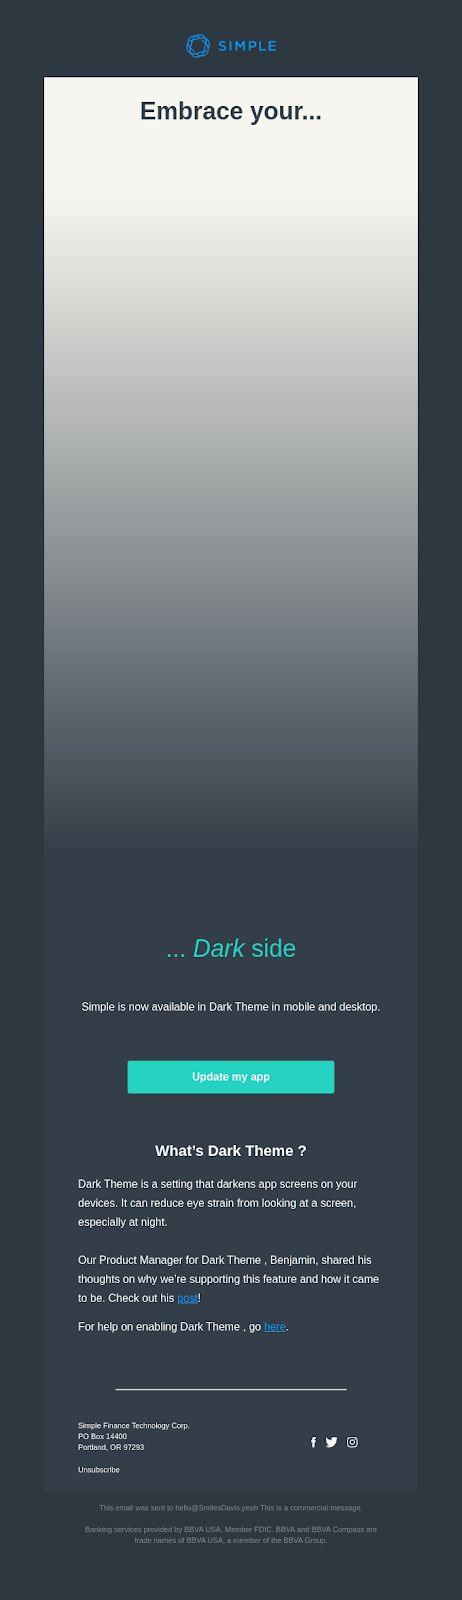 dark mode email